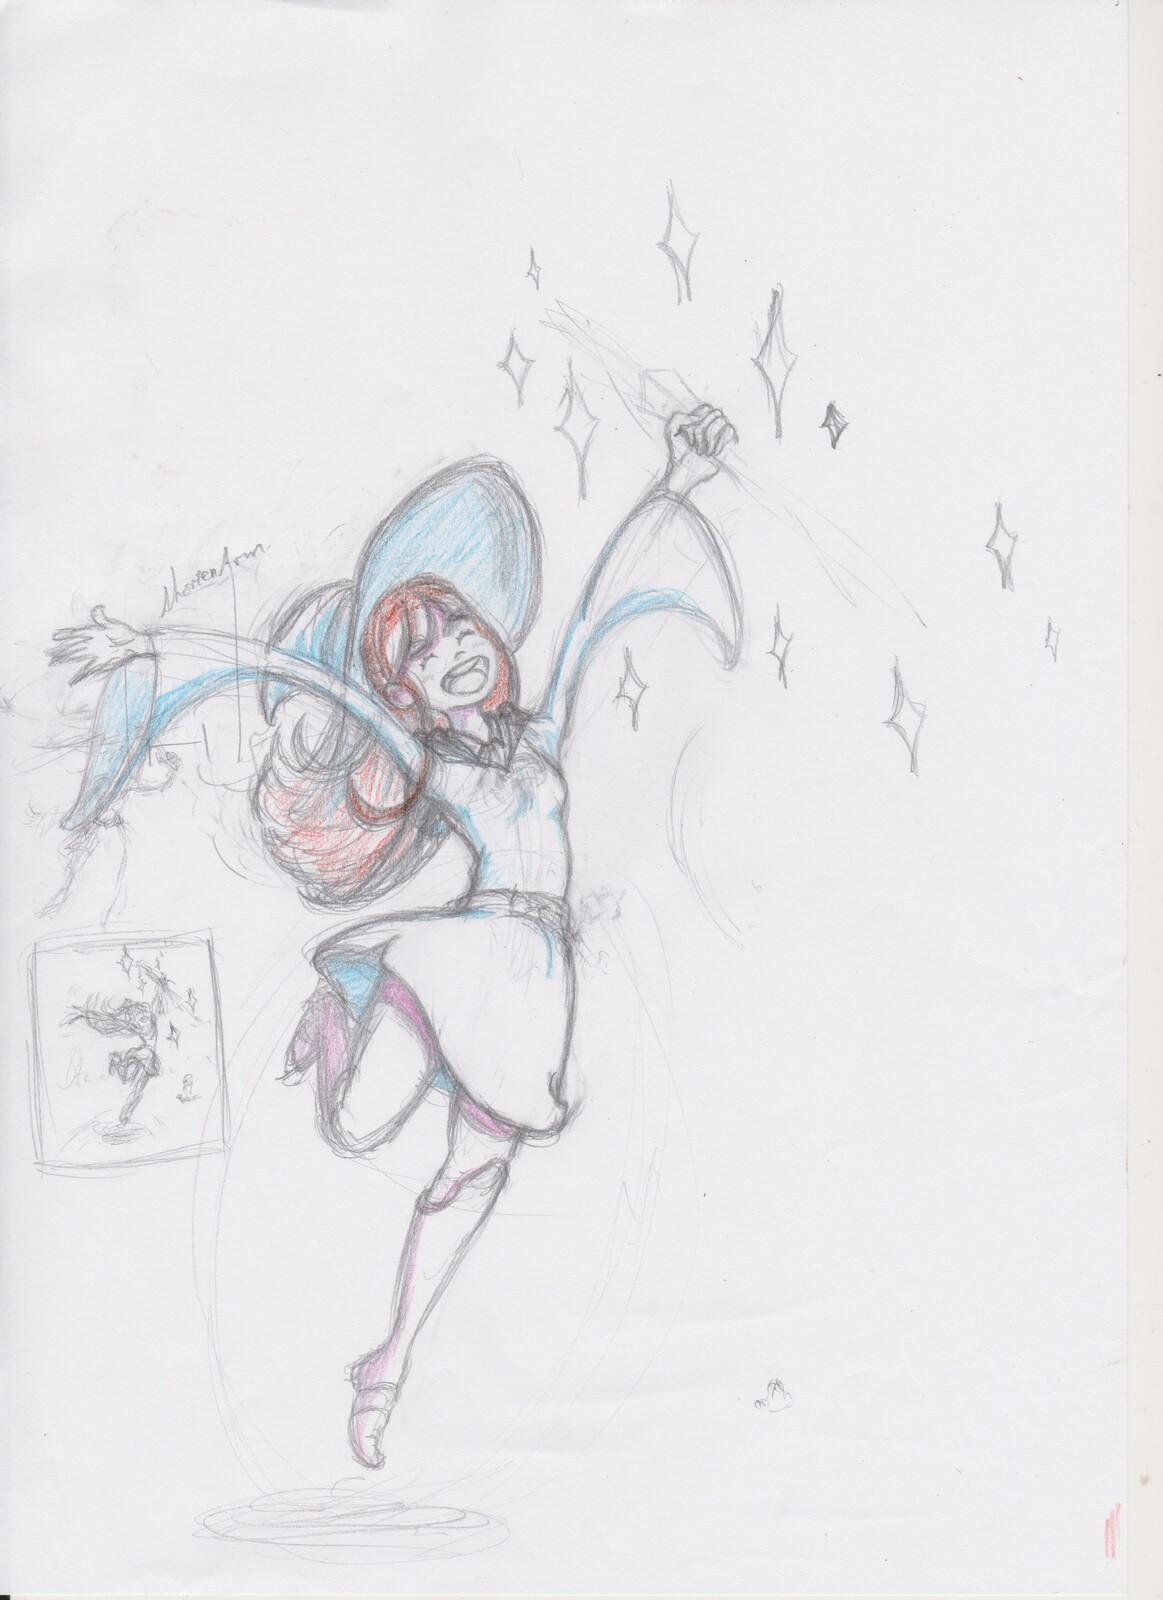 Original sketch on a piece of copy paper